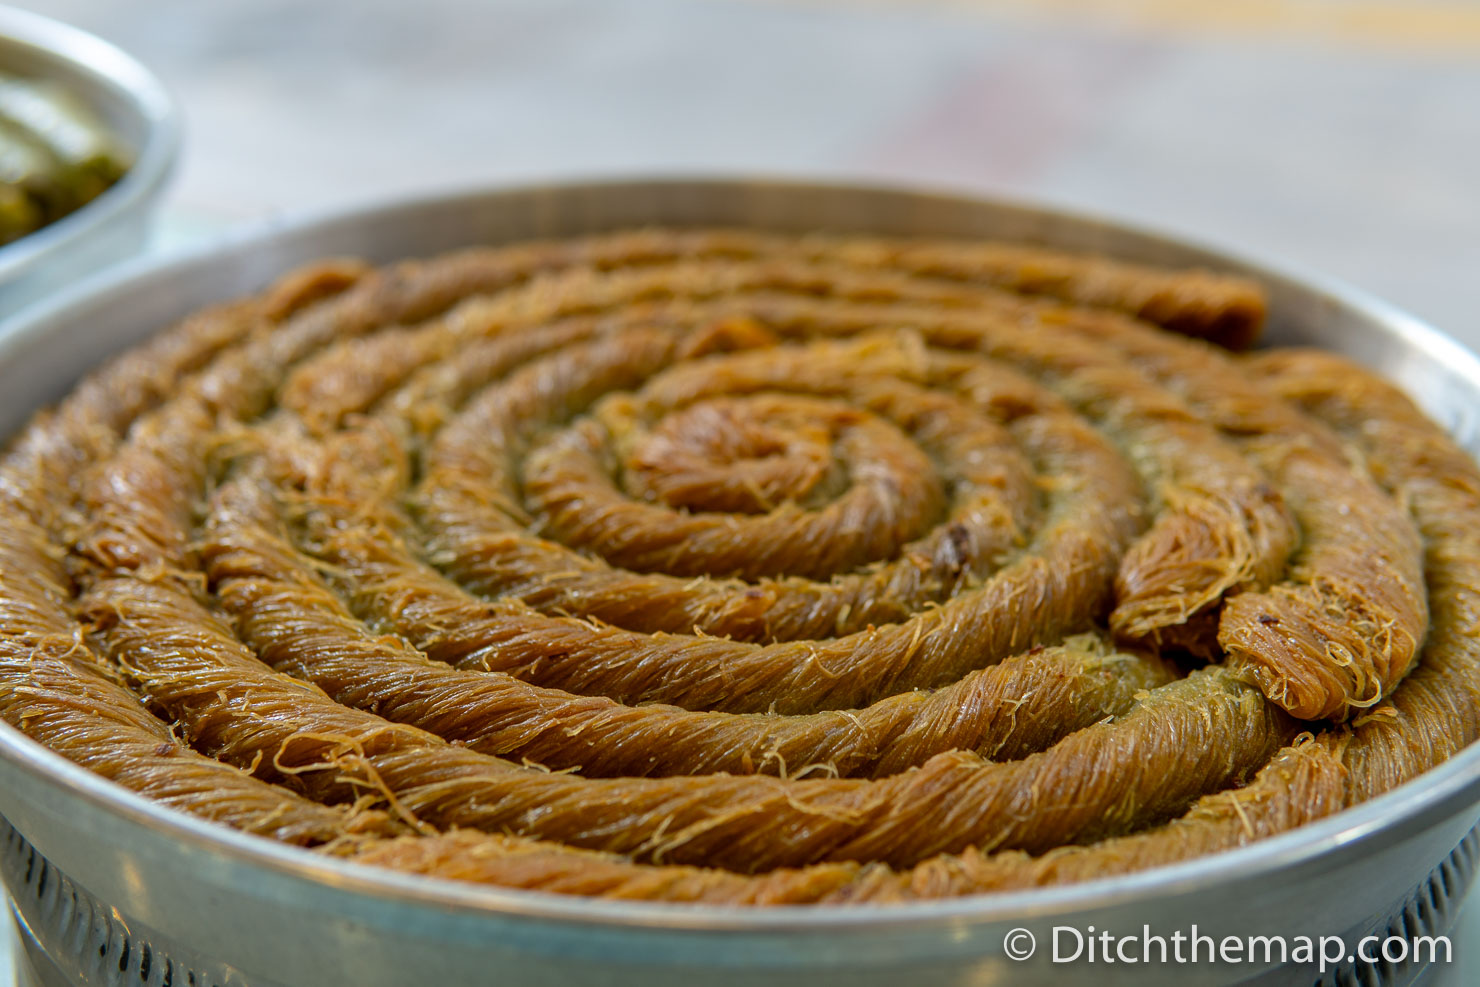 Baklava For Sale. in Gaziantep